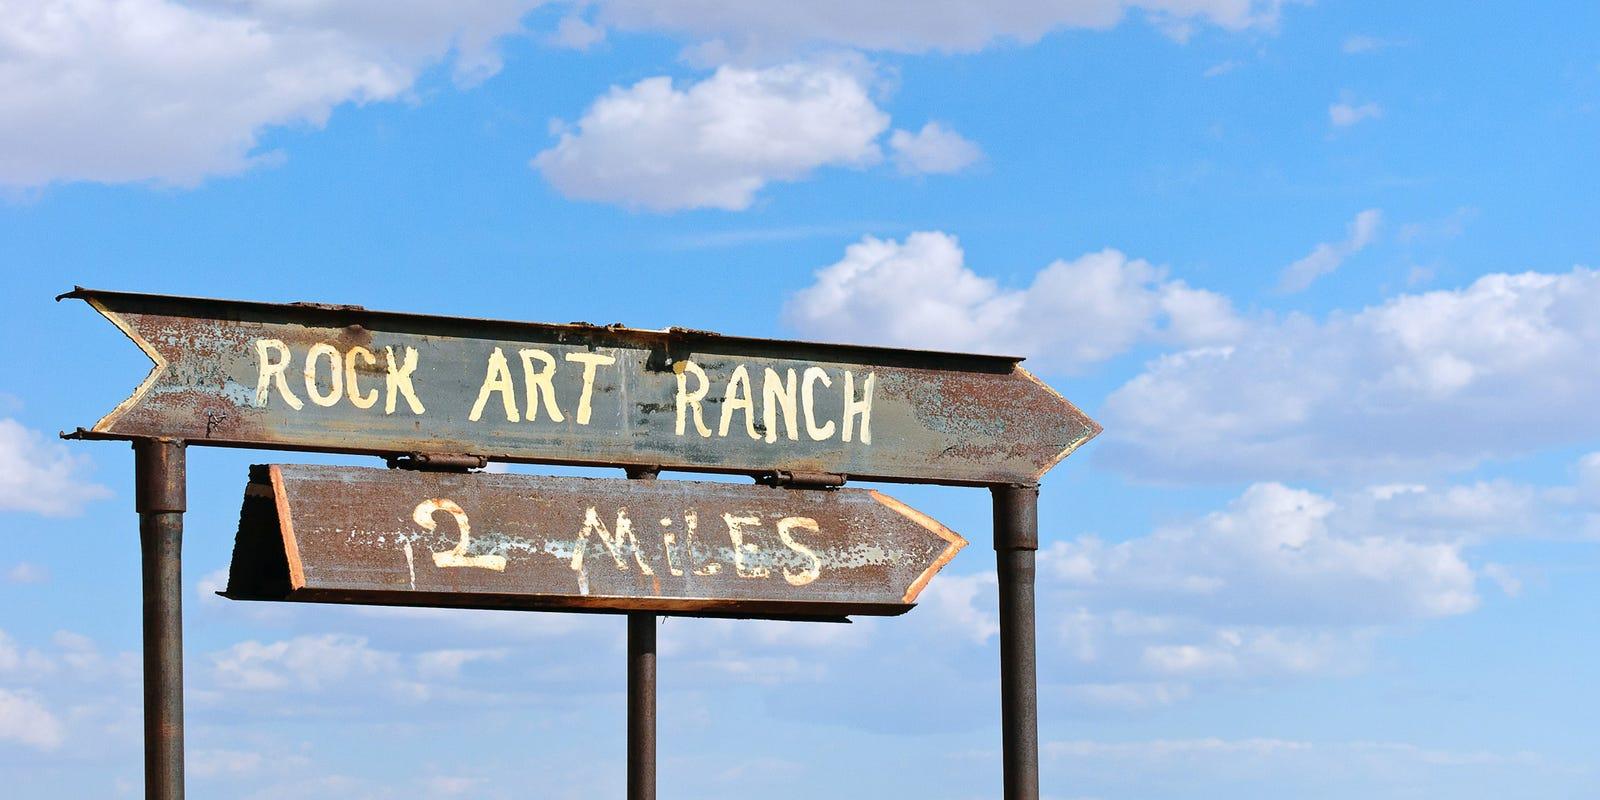 Rock Art Ranch Arizona petroglyph site